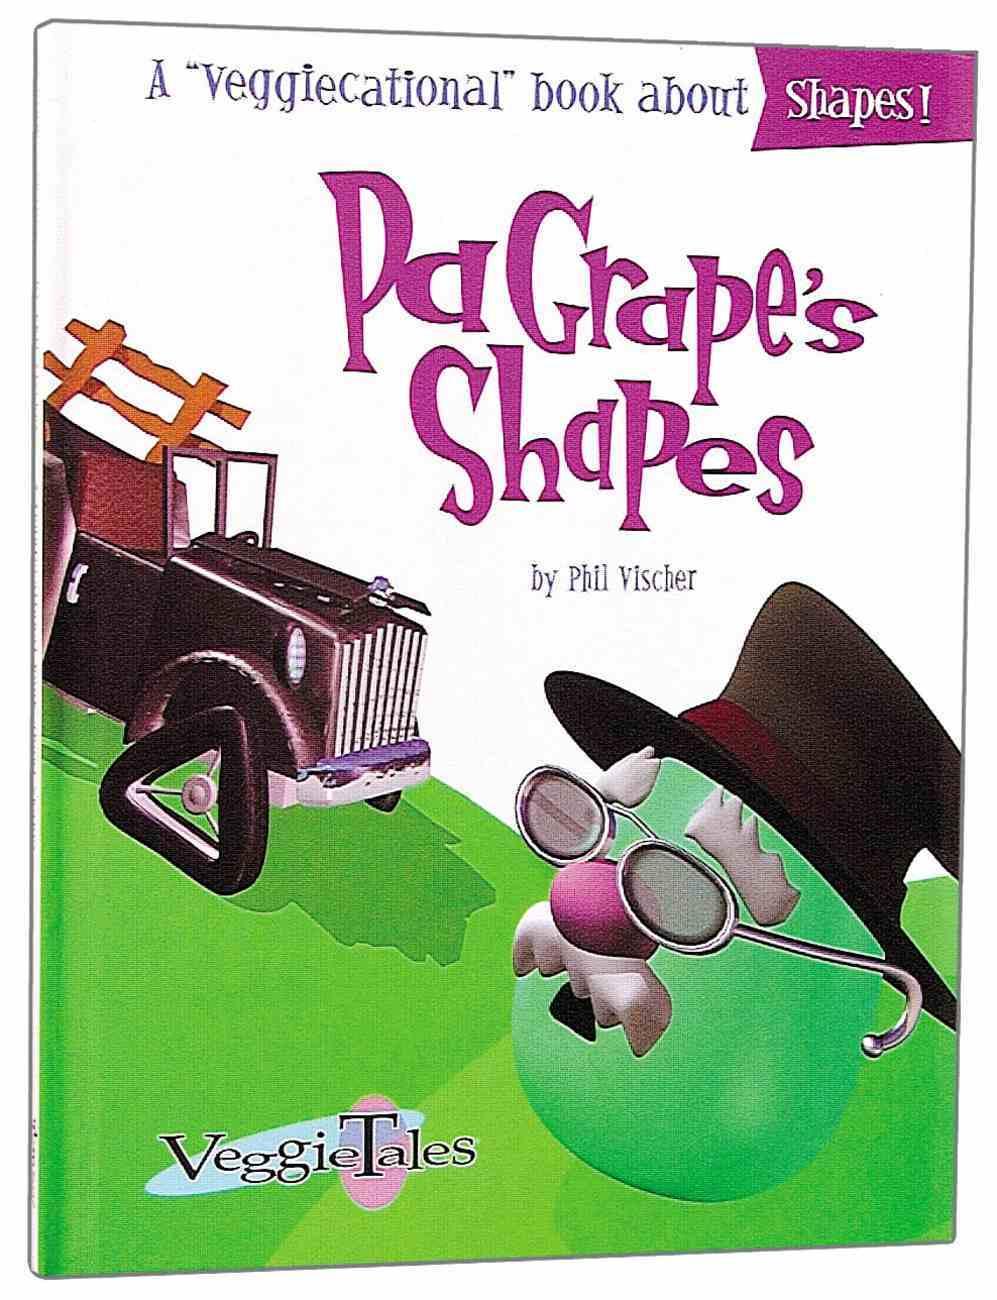 Pa Grapes' Shapes (Veggie Tales (Veggietales) Series) Hardback